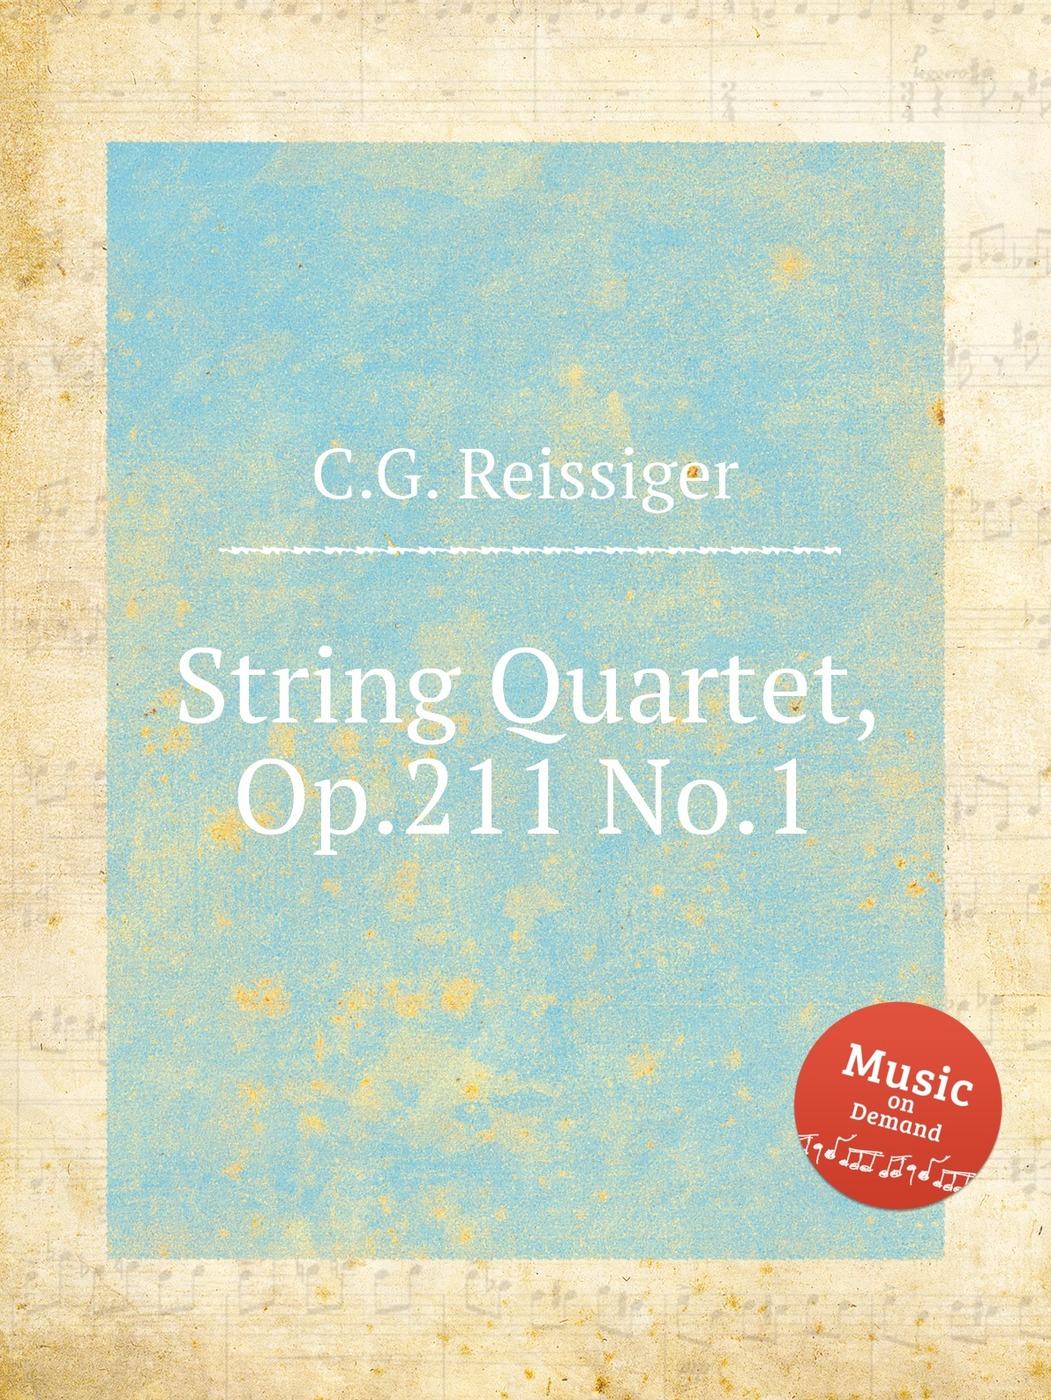 String Quartet, Op.211 No.1